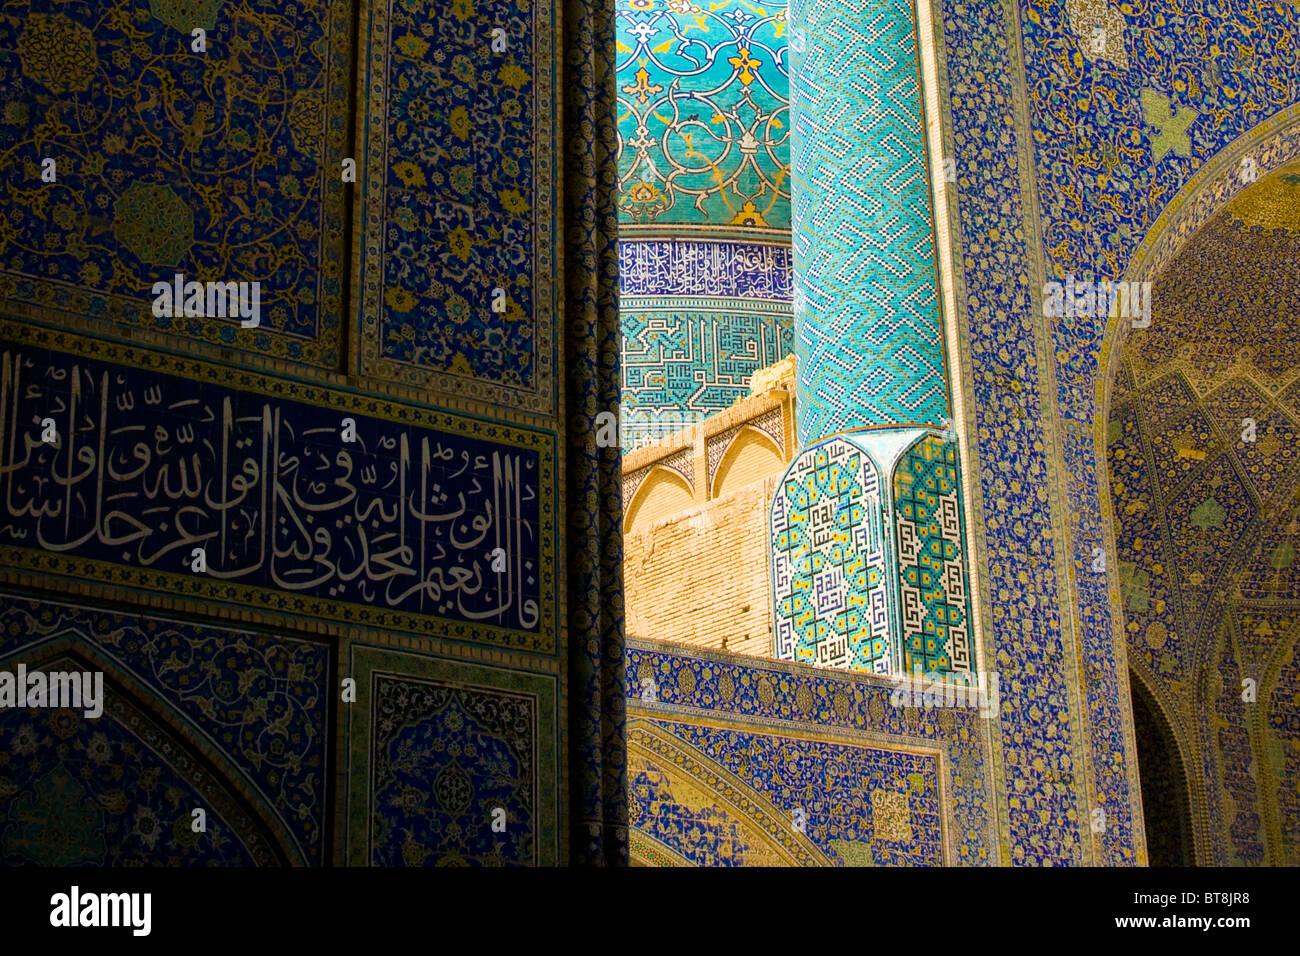 El imam o mezquita Shah, Isfahán, Irán Imagen De Stock